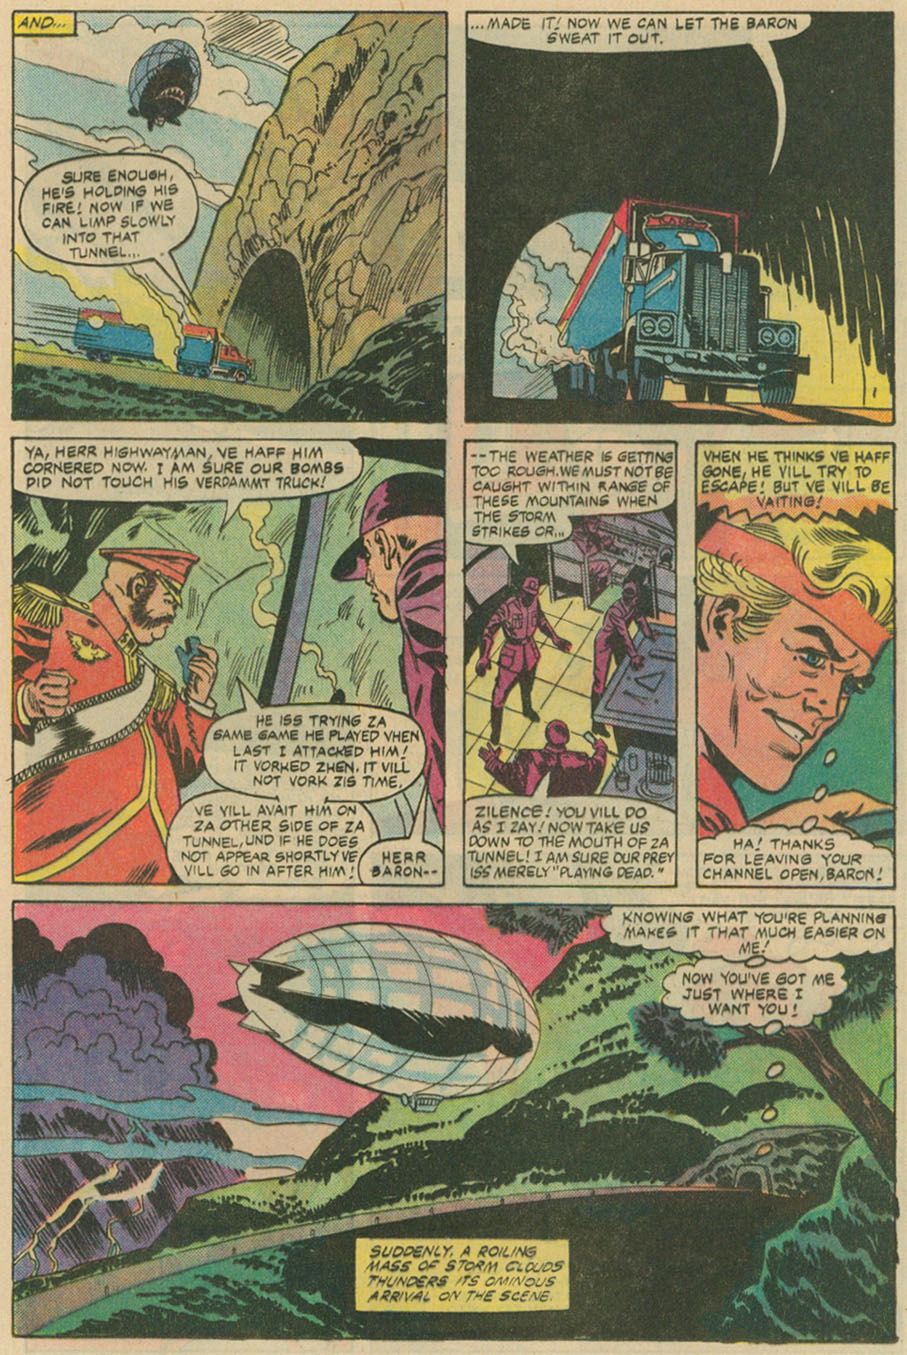 Read online U.S. 1 comic -  Issue #4 - 18